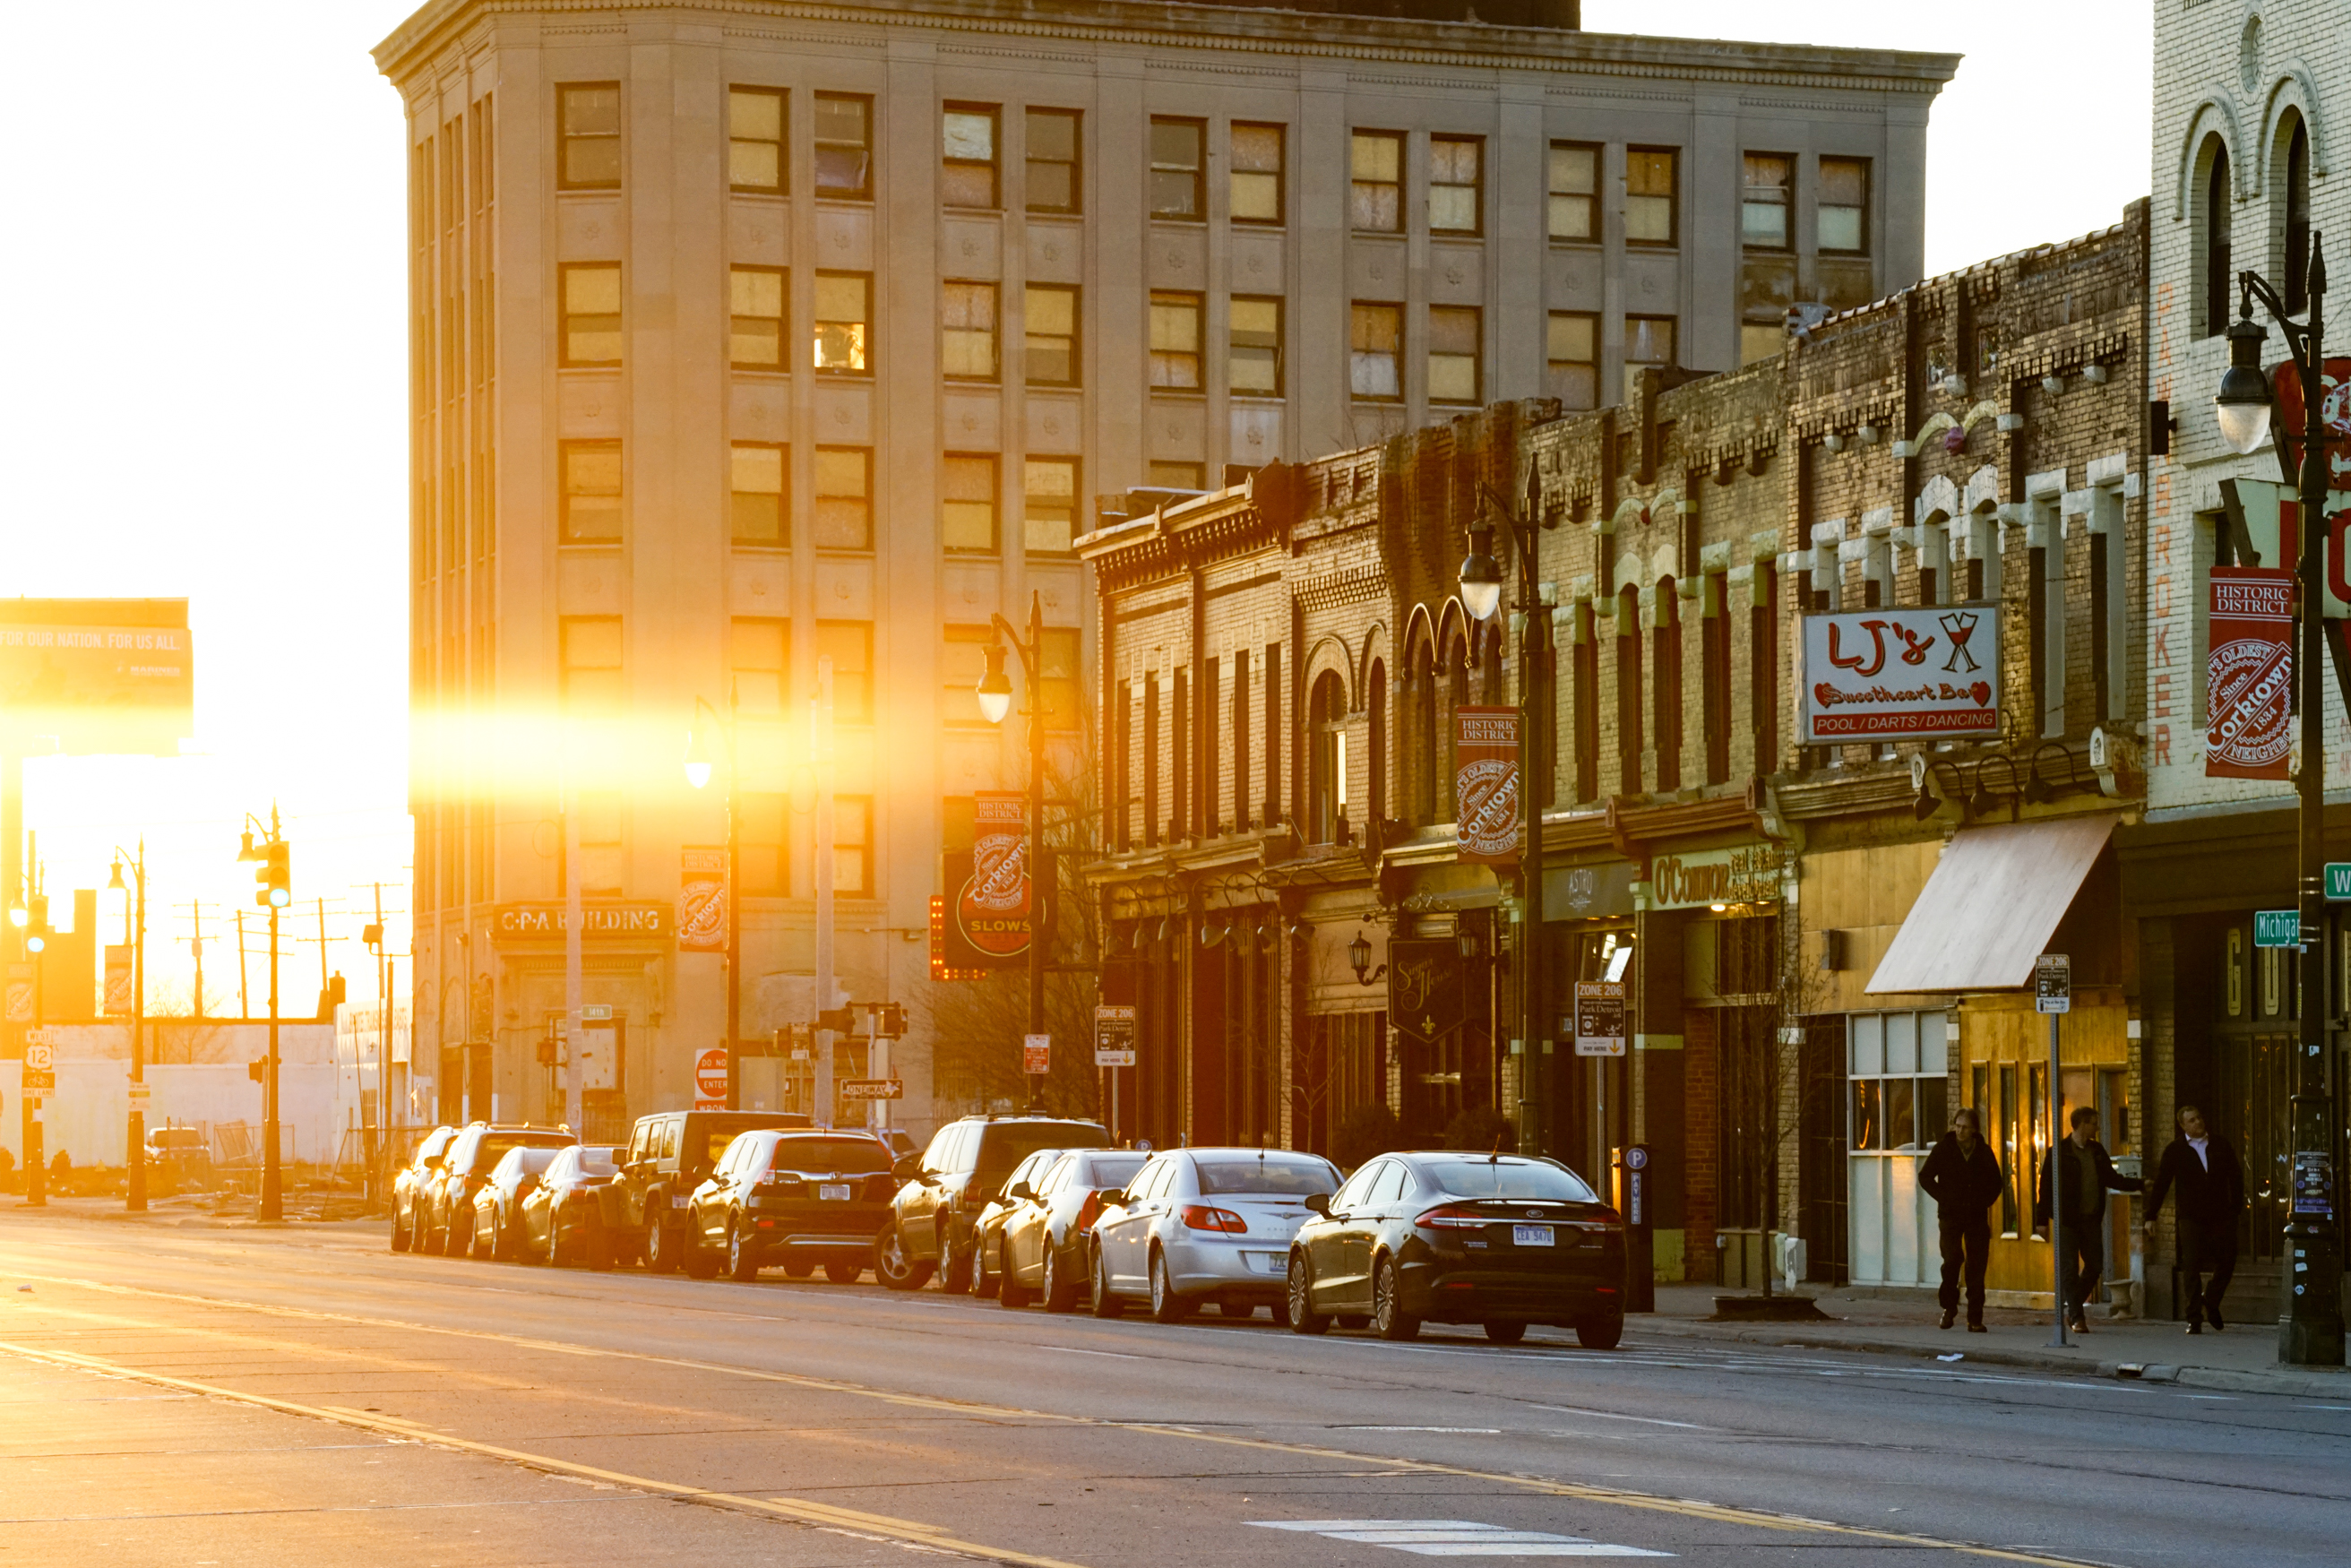 Corktown Detroit at sunset